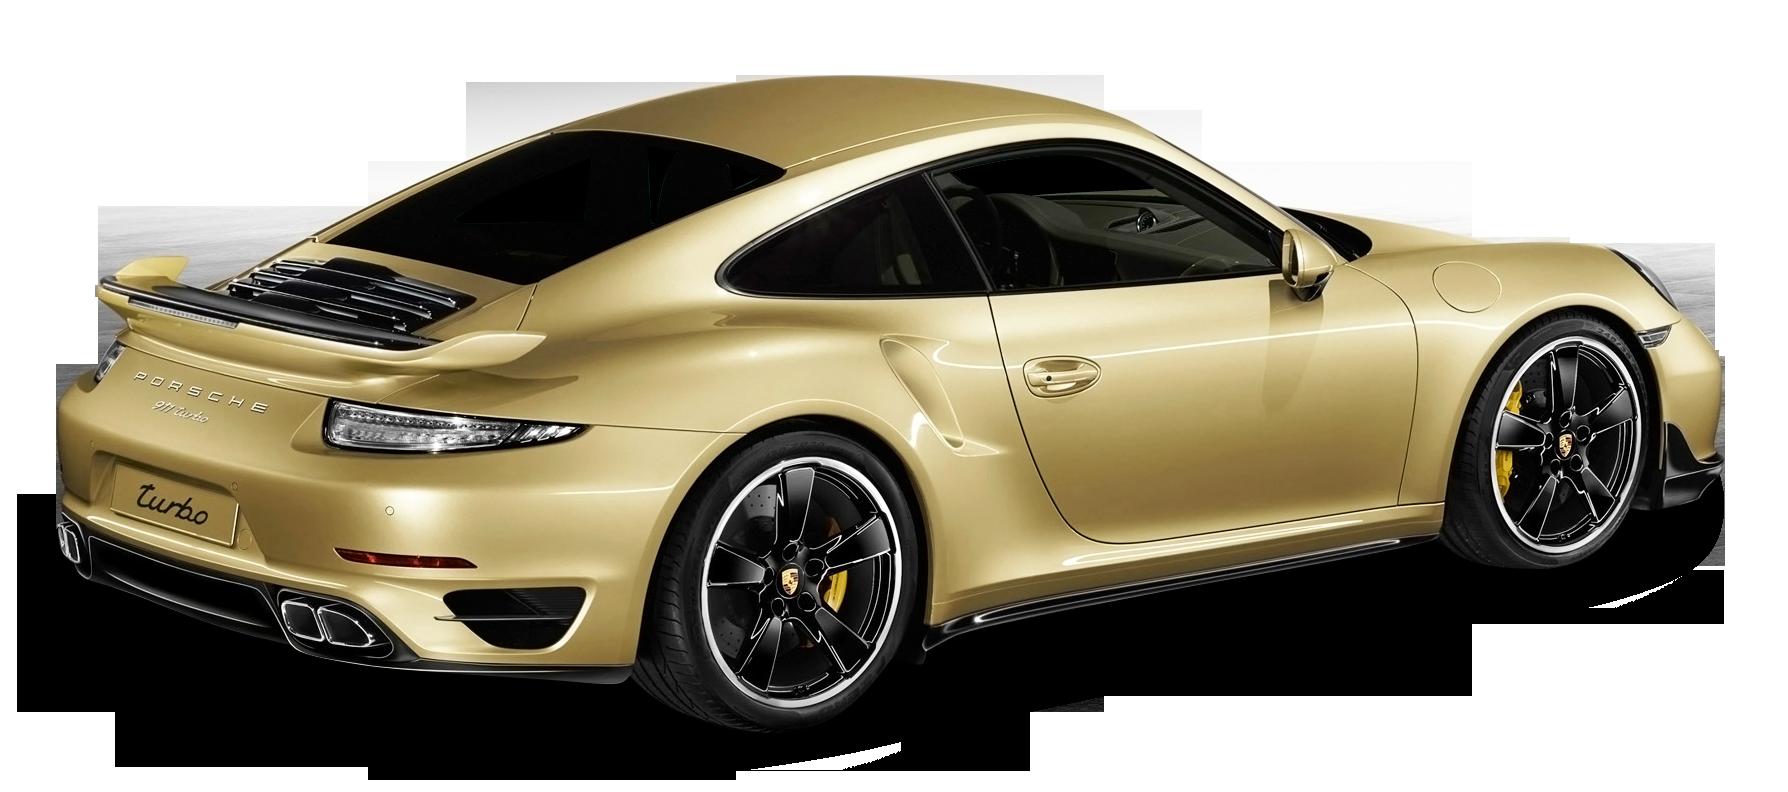 Porsche 911 Turbo Aerokit Gold Car